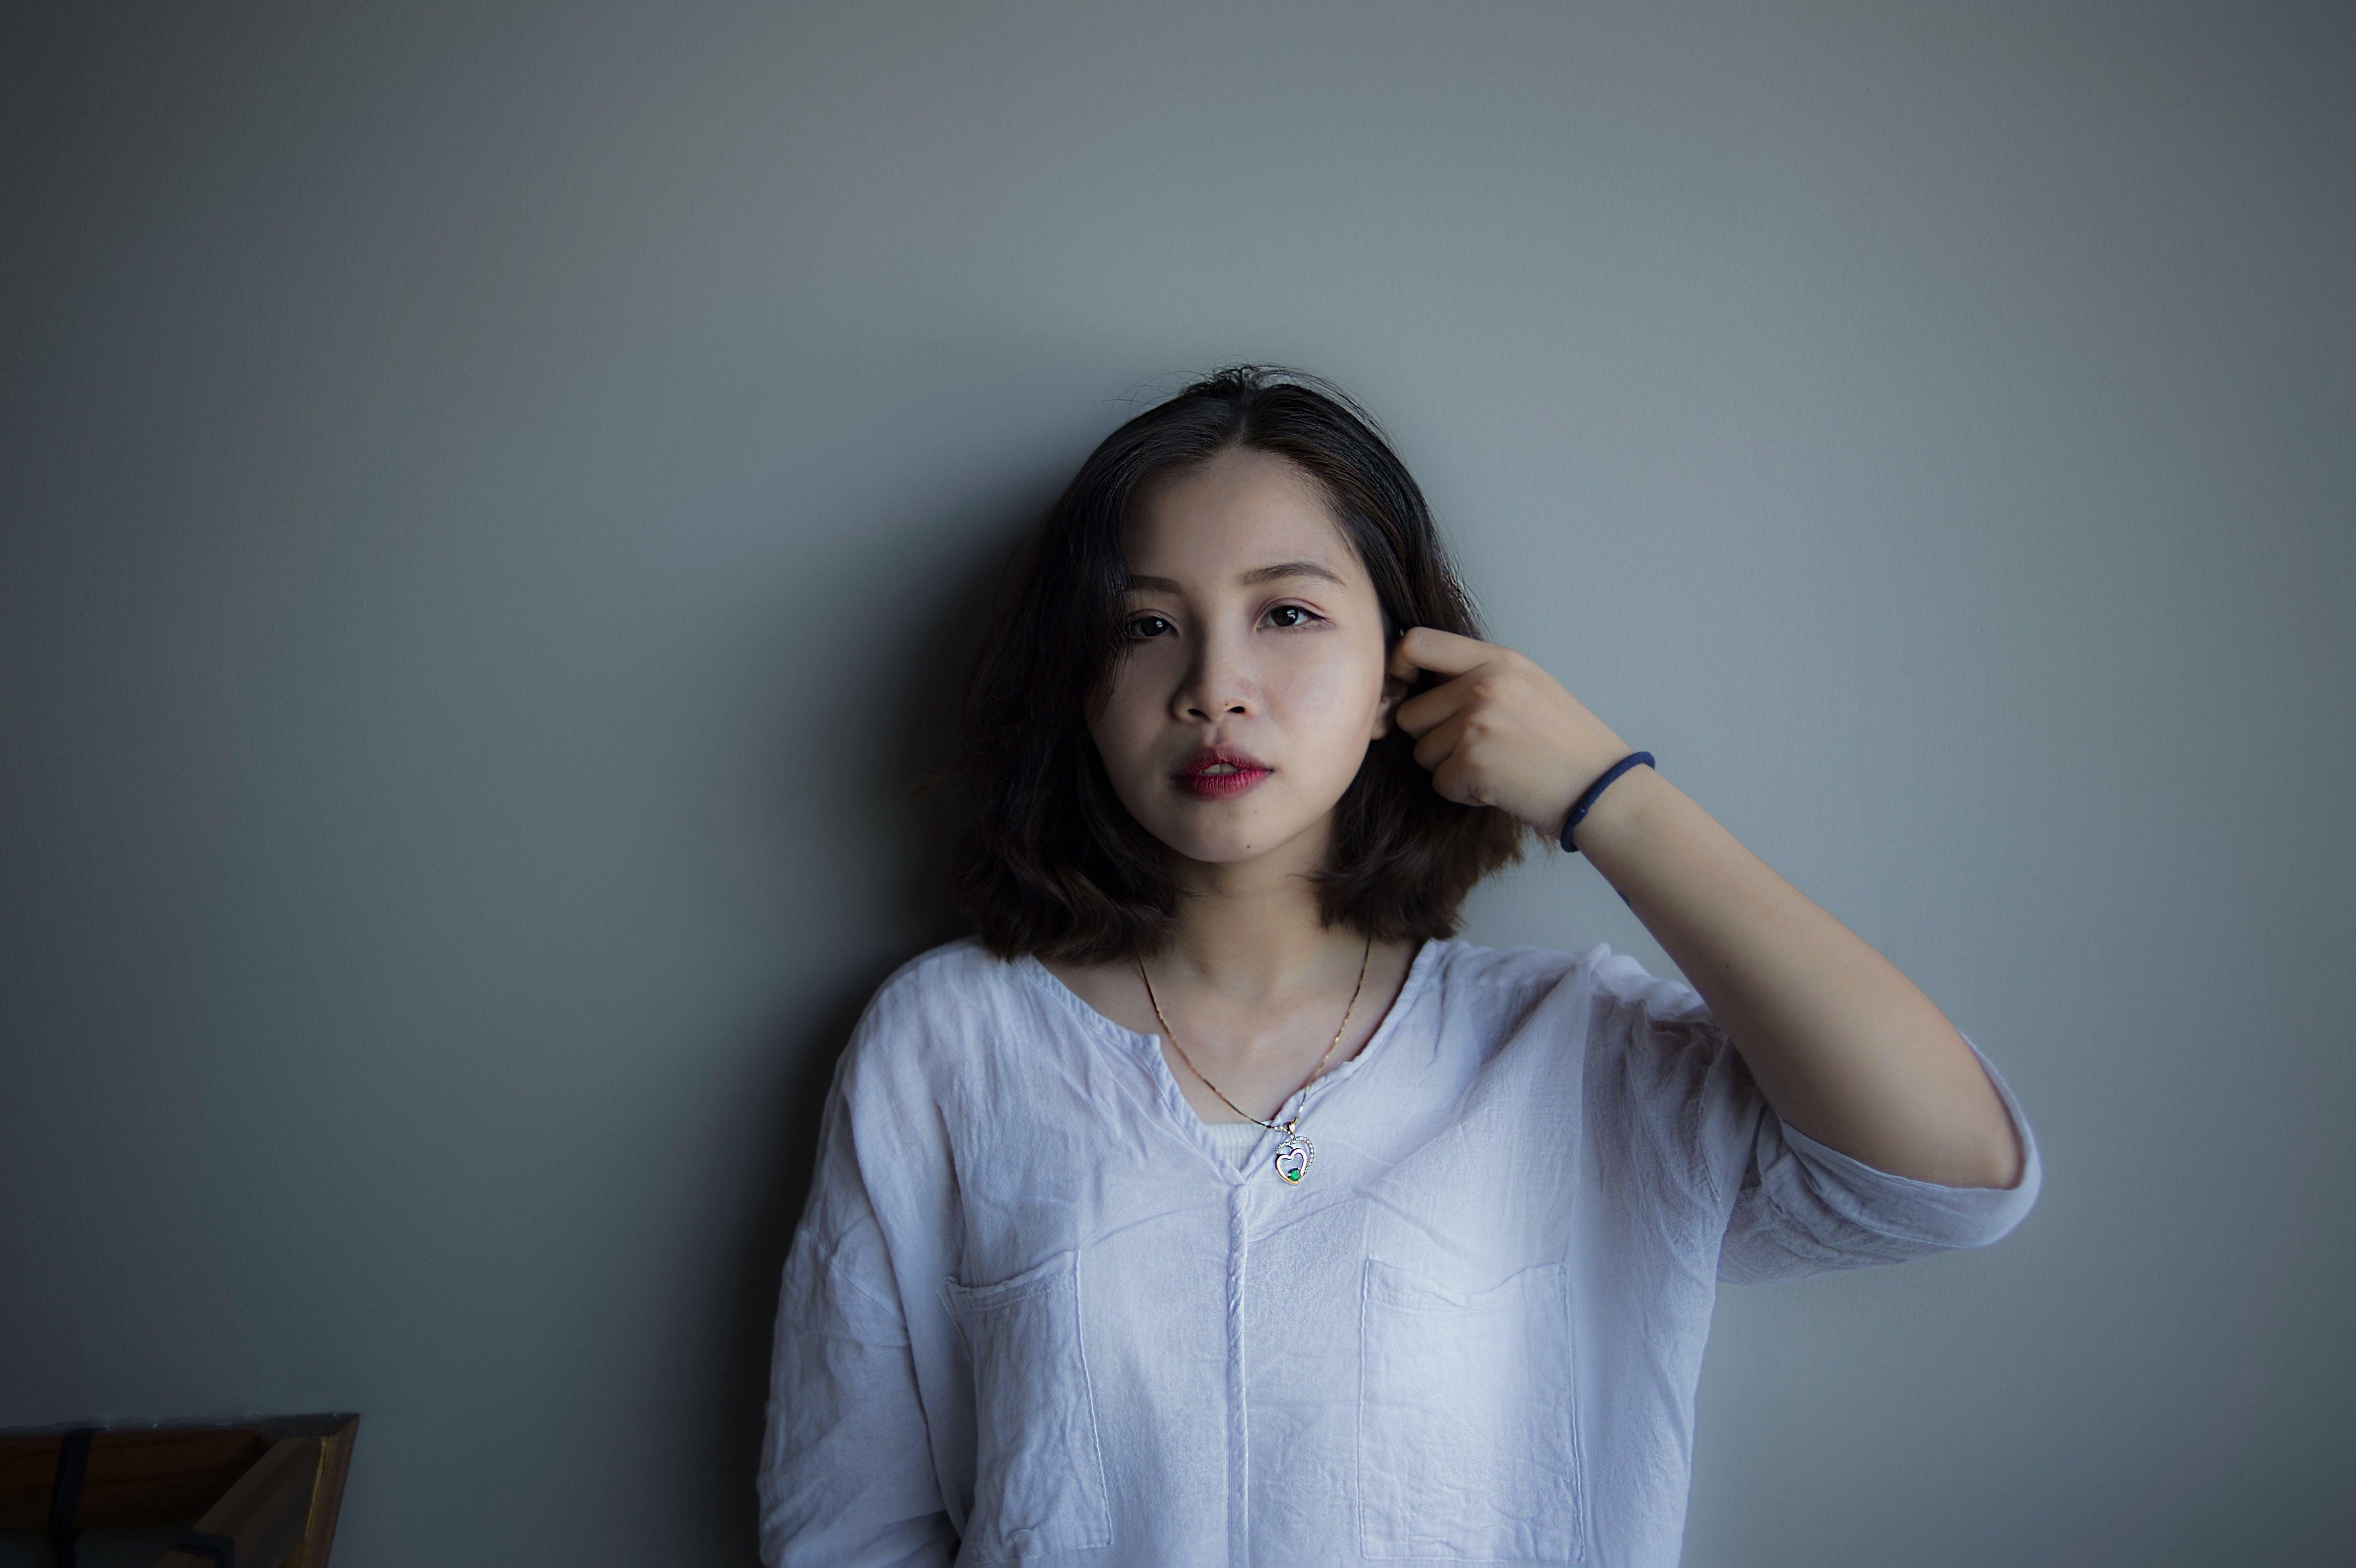 Woman Wearing Blue Long-sleeved Shirt